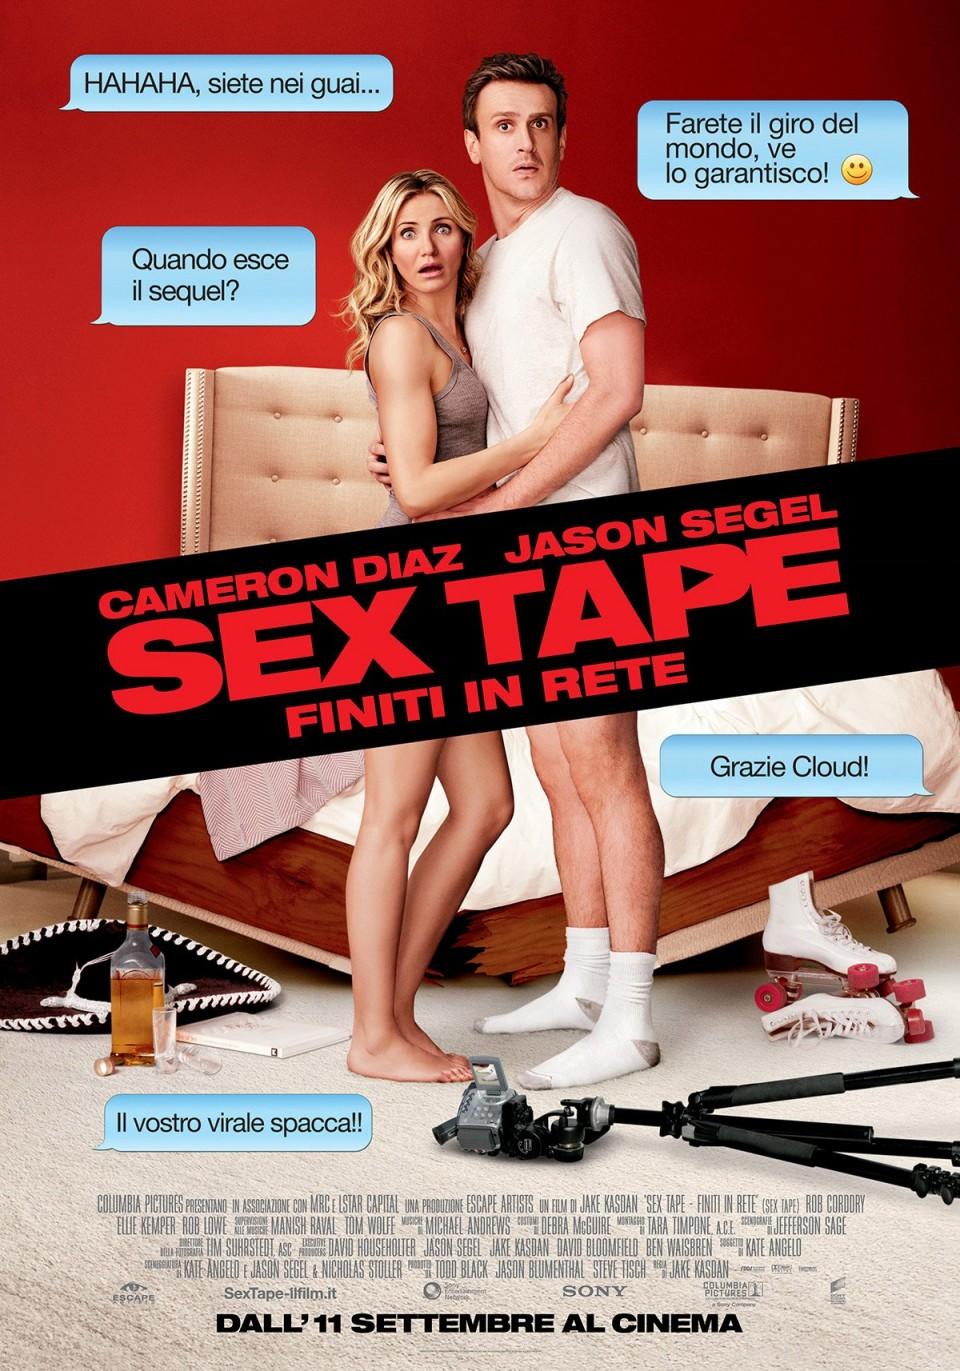 Sex Tape - Finiti in Rete